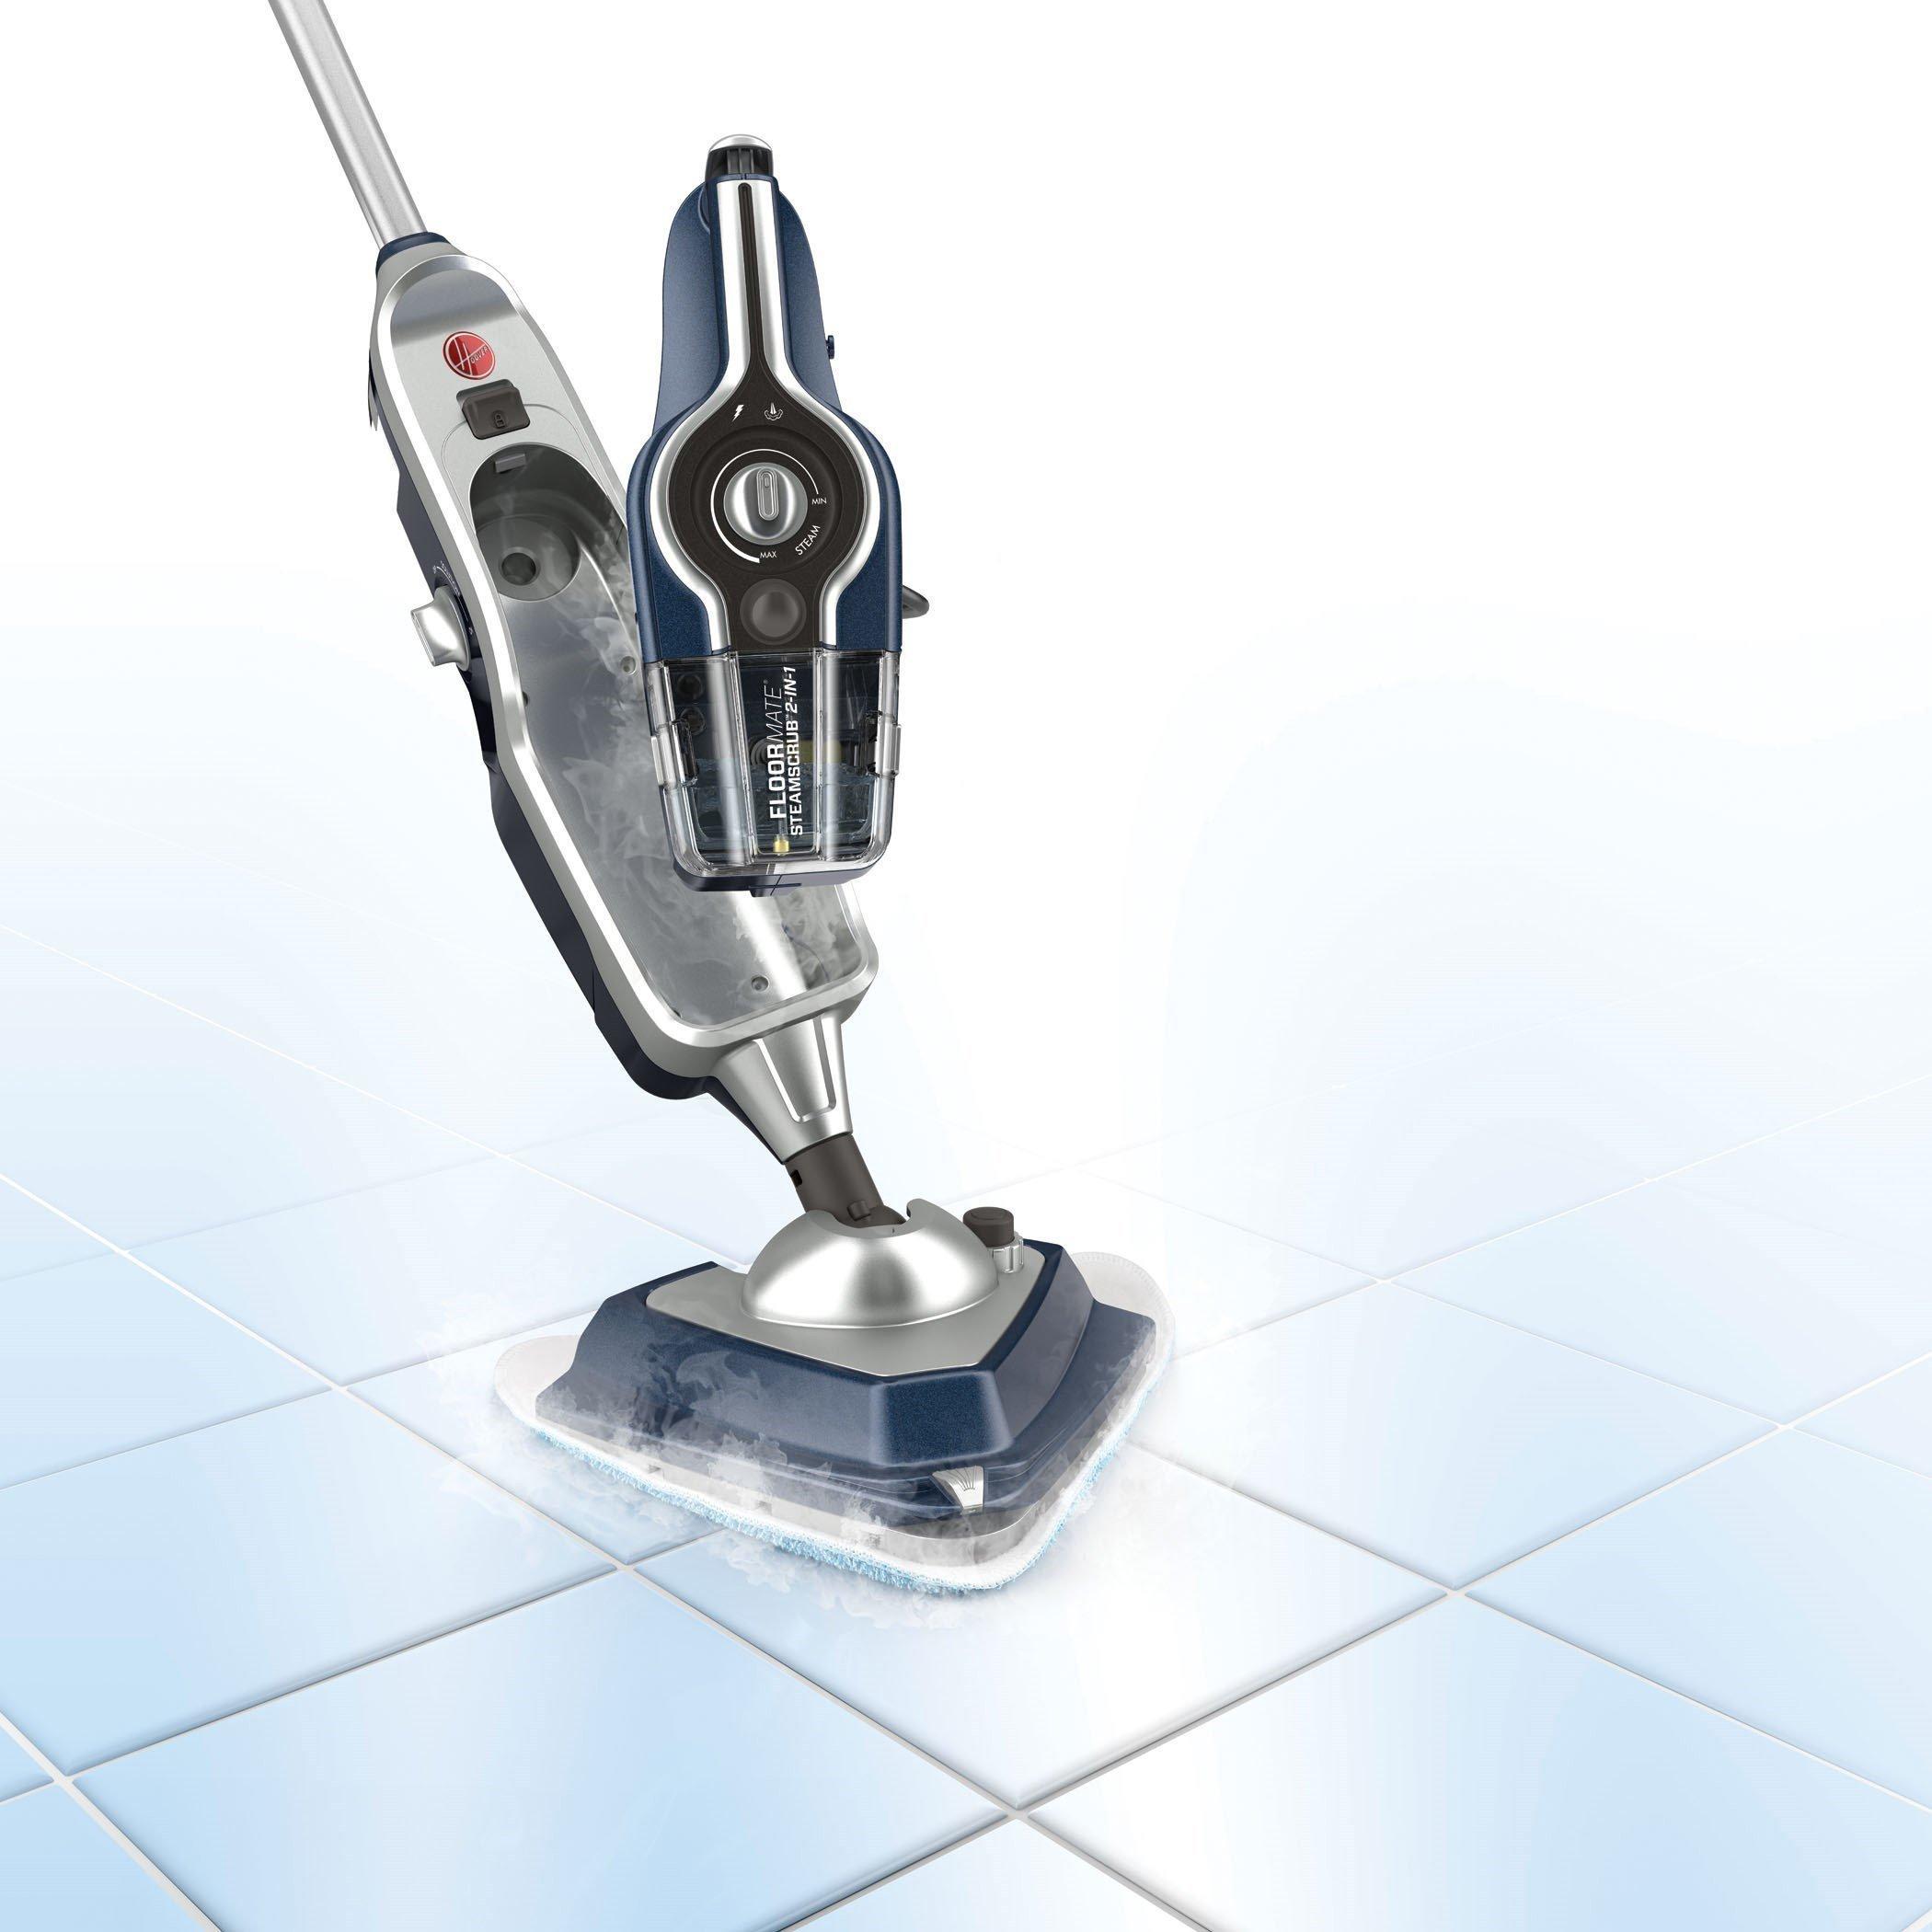 Reconditioned SteamScrub 2-IN-1 Steam Mop4